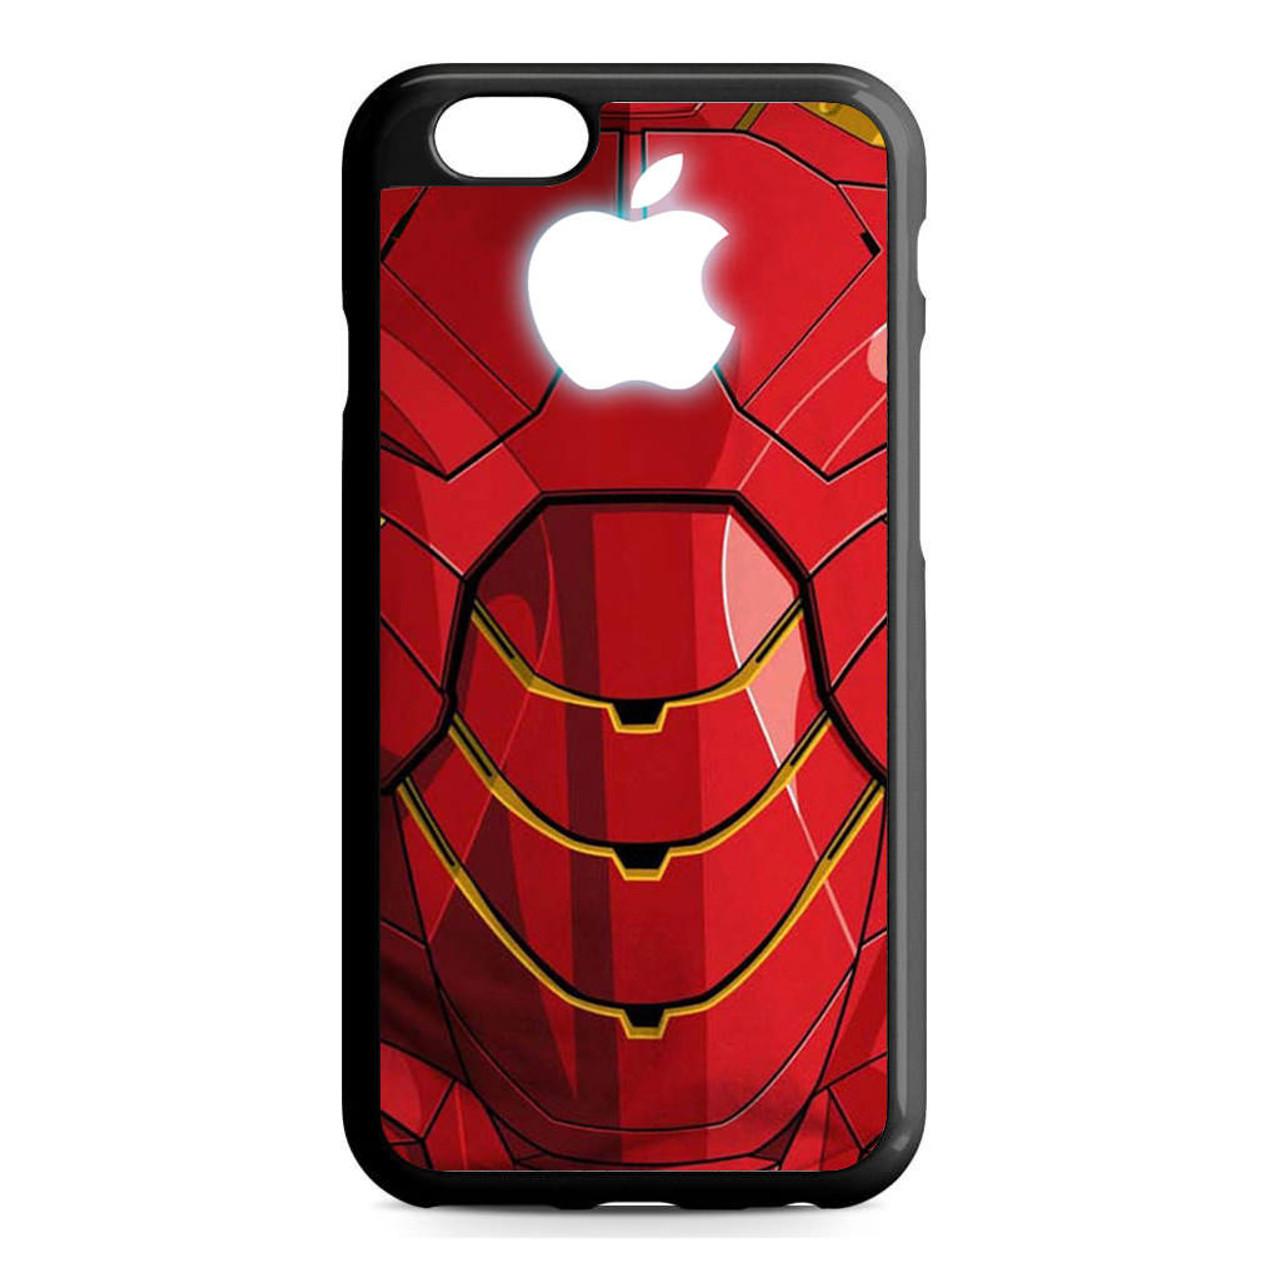 Iron man apple logo iPhone 6/6S Case